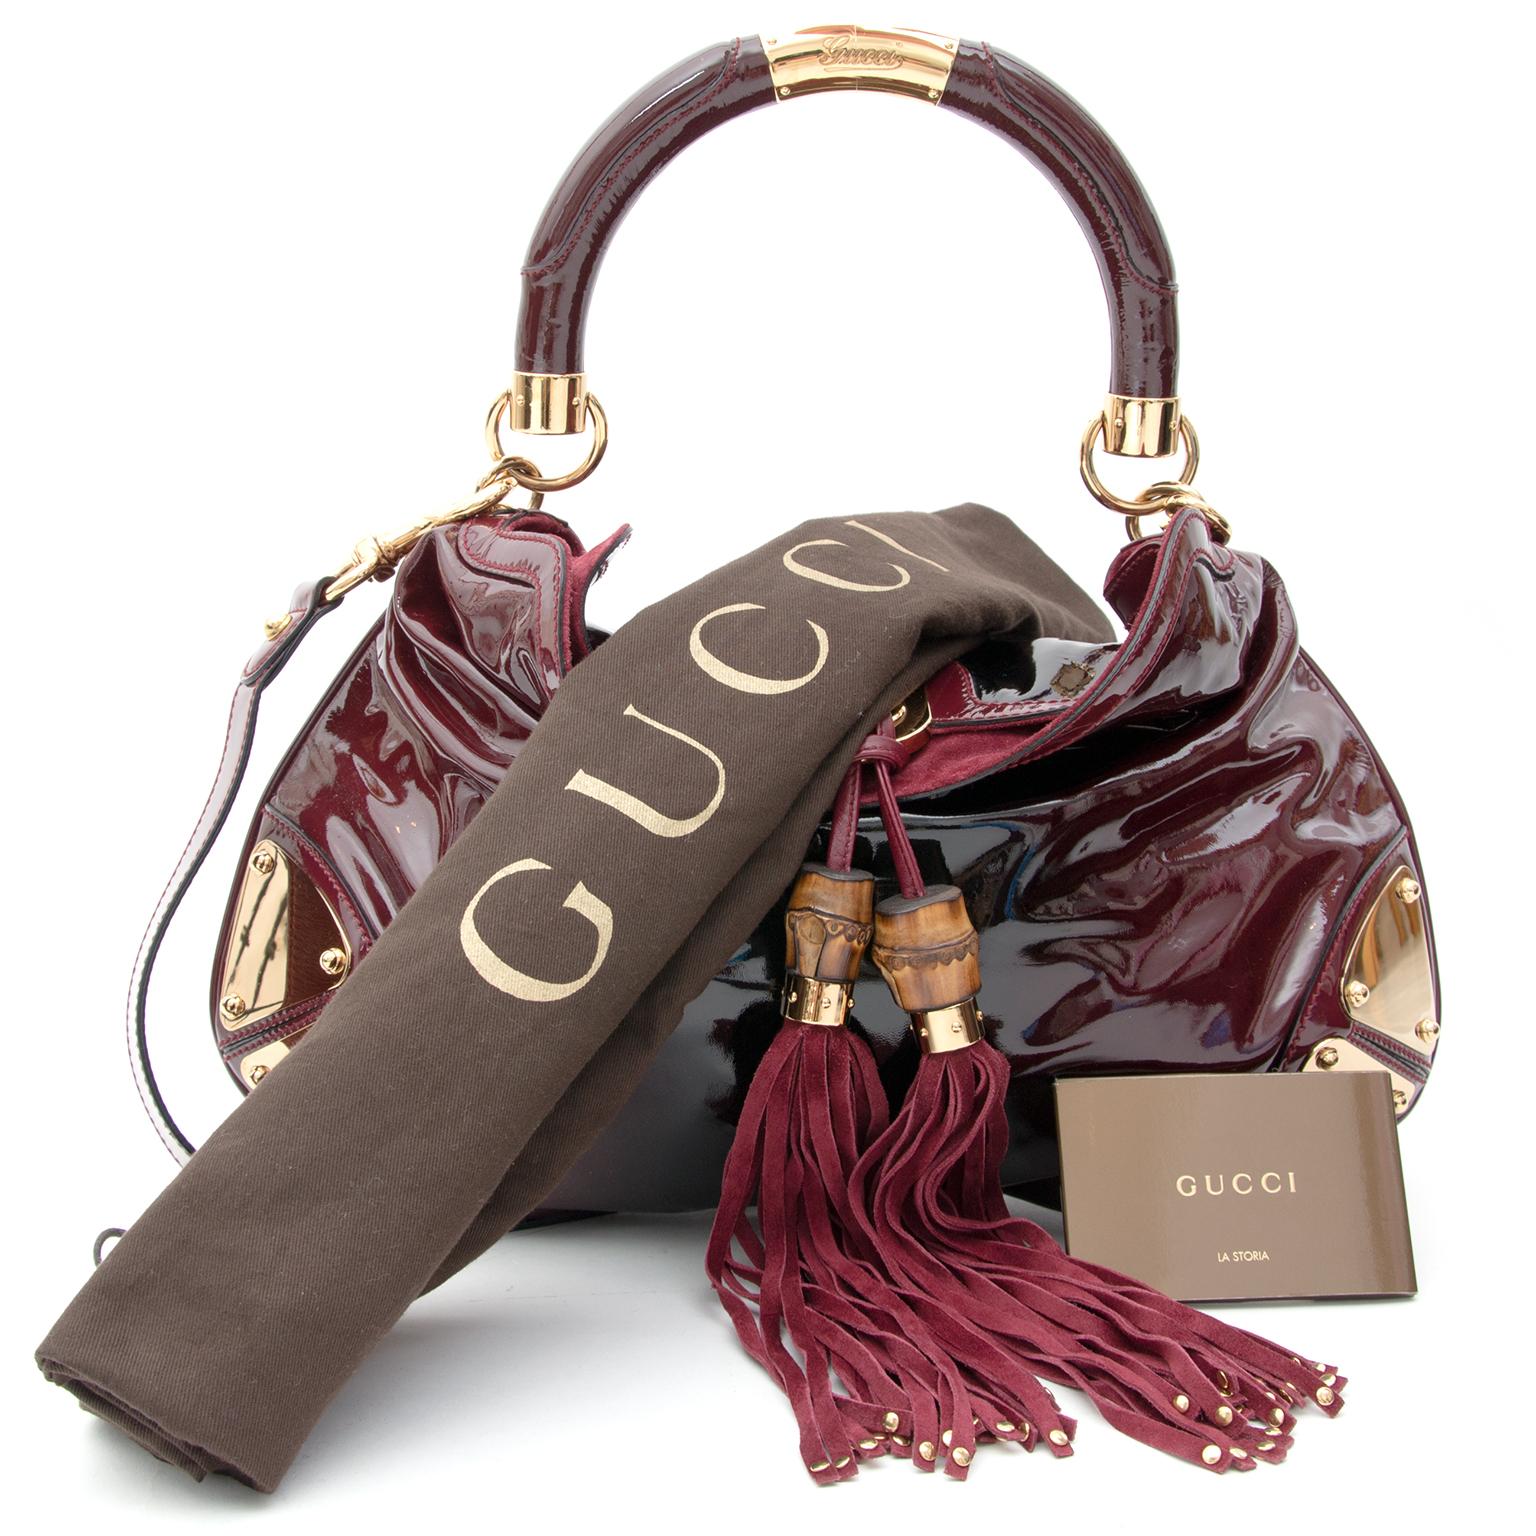 c167c59377 ... acheter en ligne seconde main sac a main Gucci Bouska ombre sac en cuir  site en